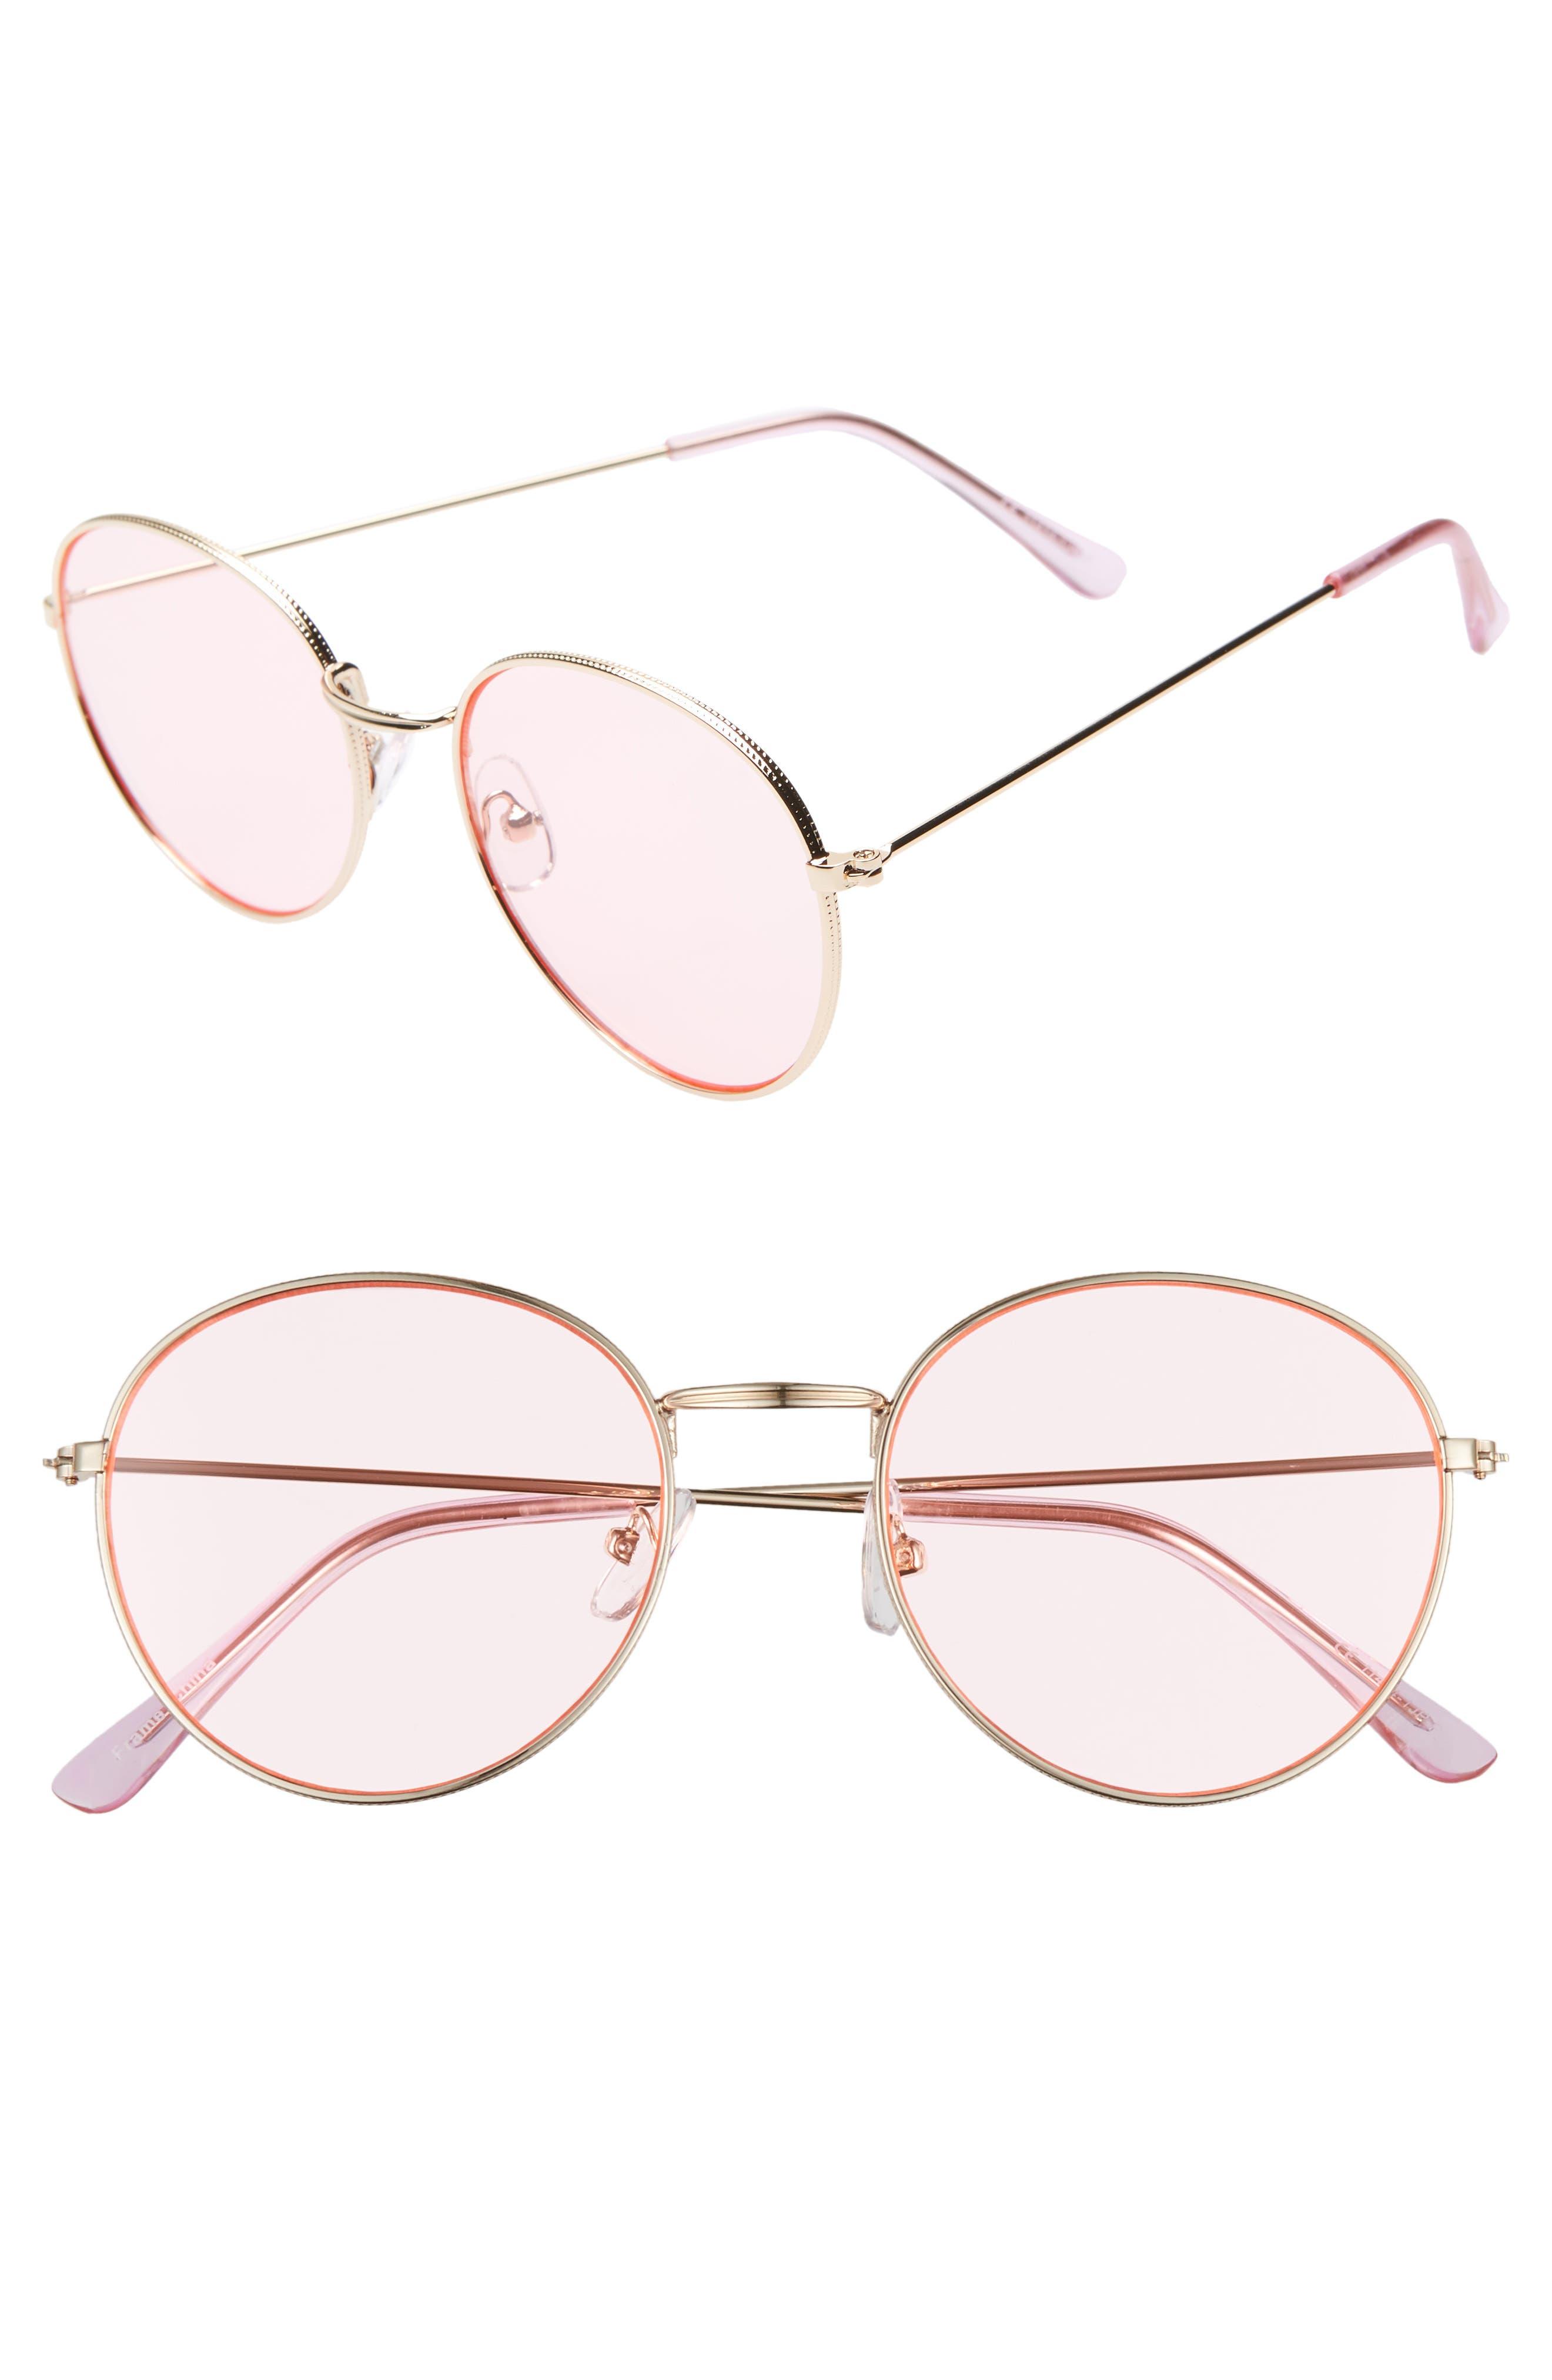 GLANCE EYEWEAR 50mm Thin Metal Round Sunglasses, Main, color, GOLD/ PINK